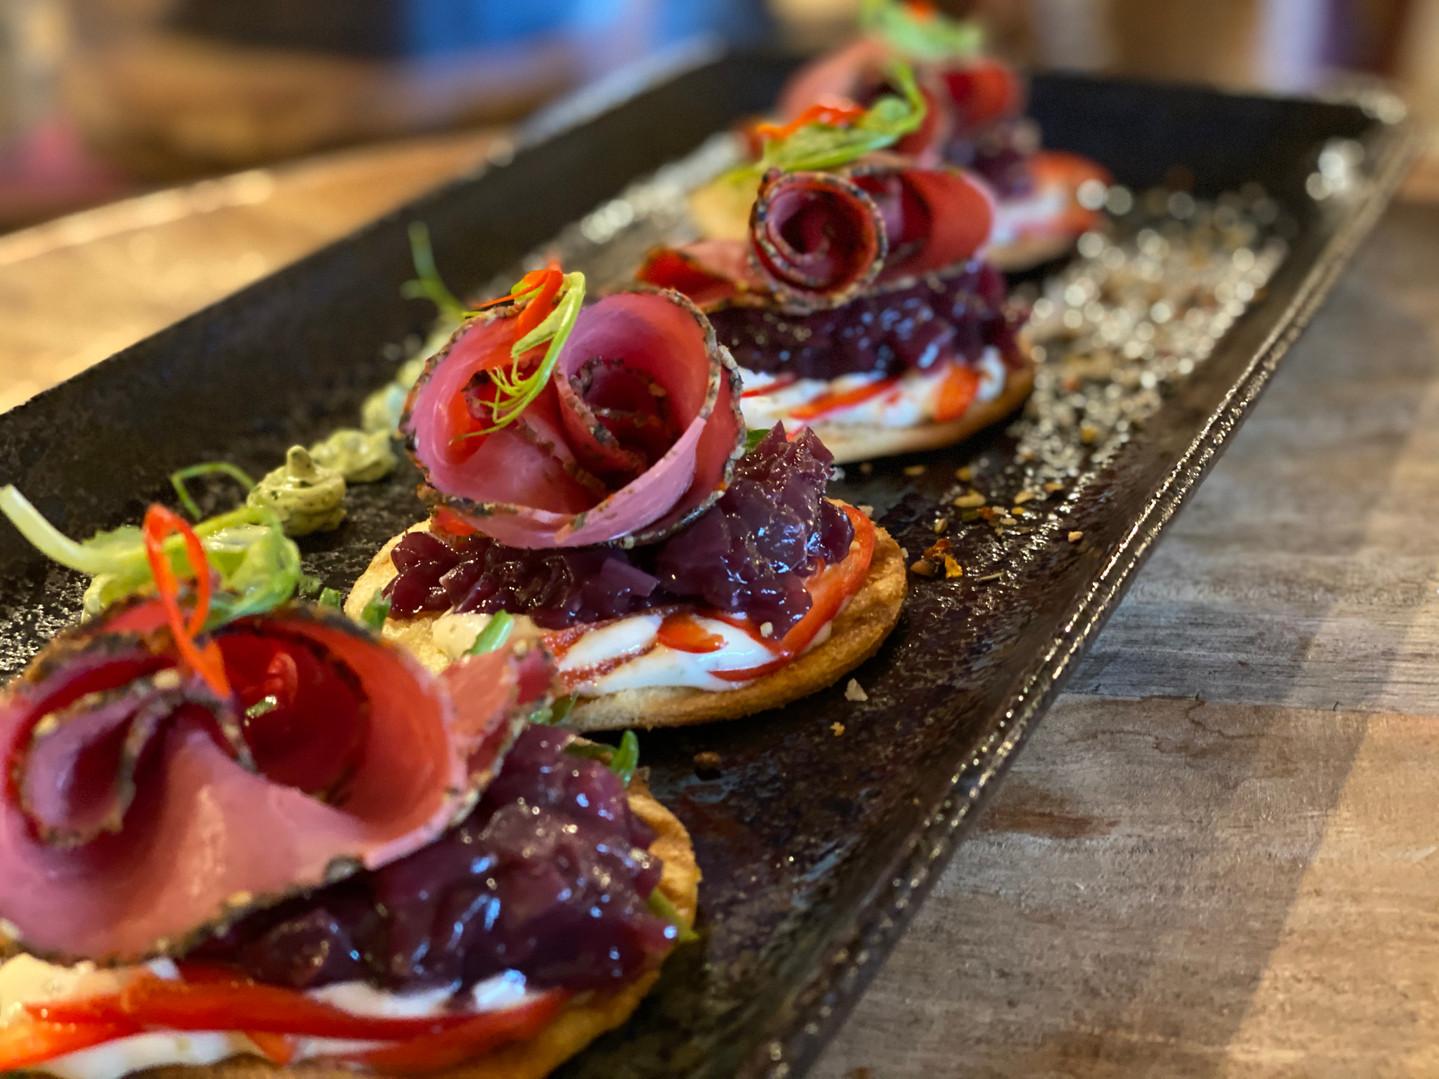 Vorspeise im Hotel Wegner - the culinary art hotel